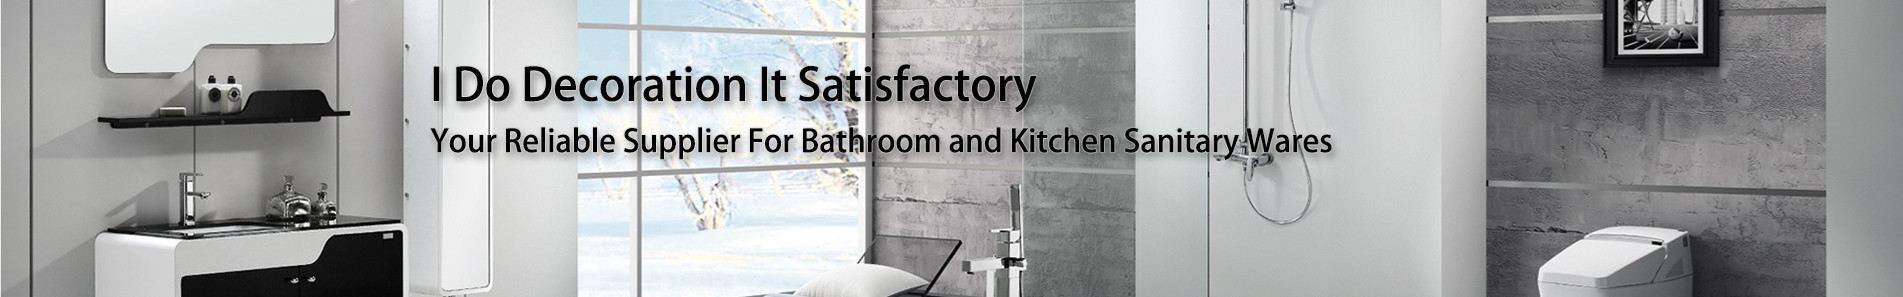 sanitary-wares